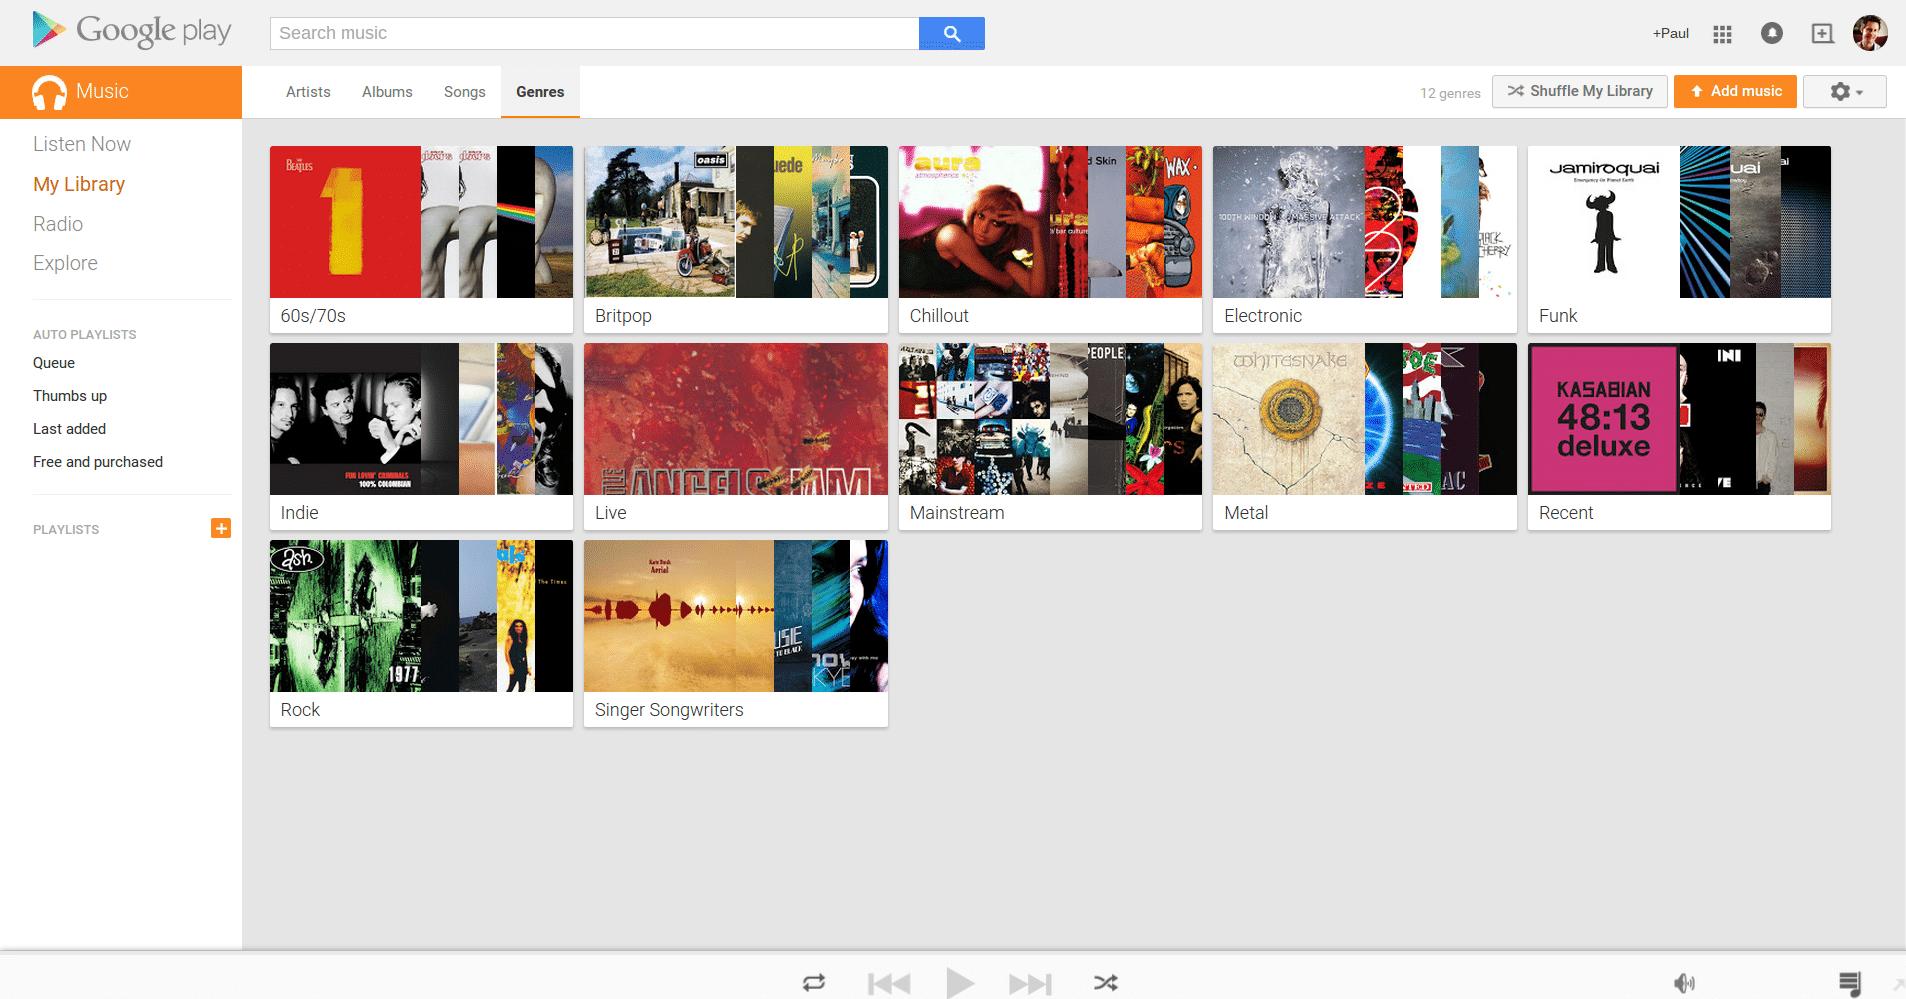 Google Play Music genre search